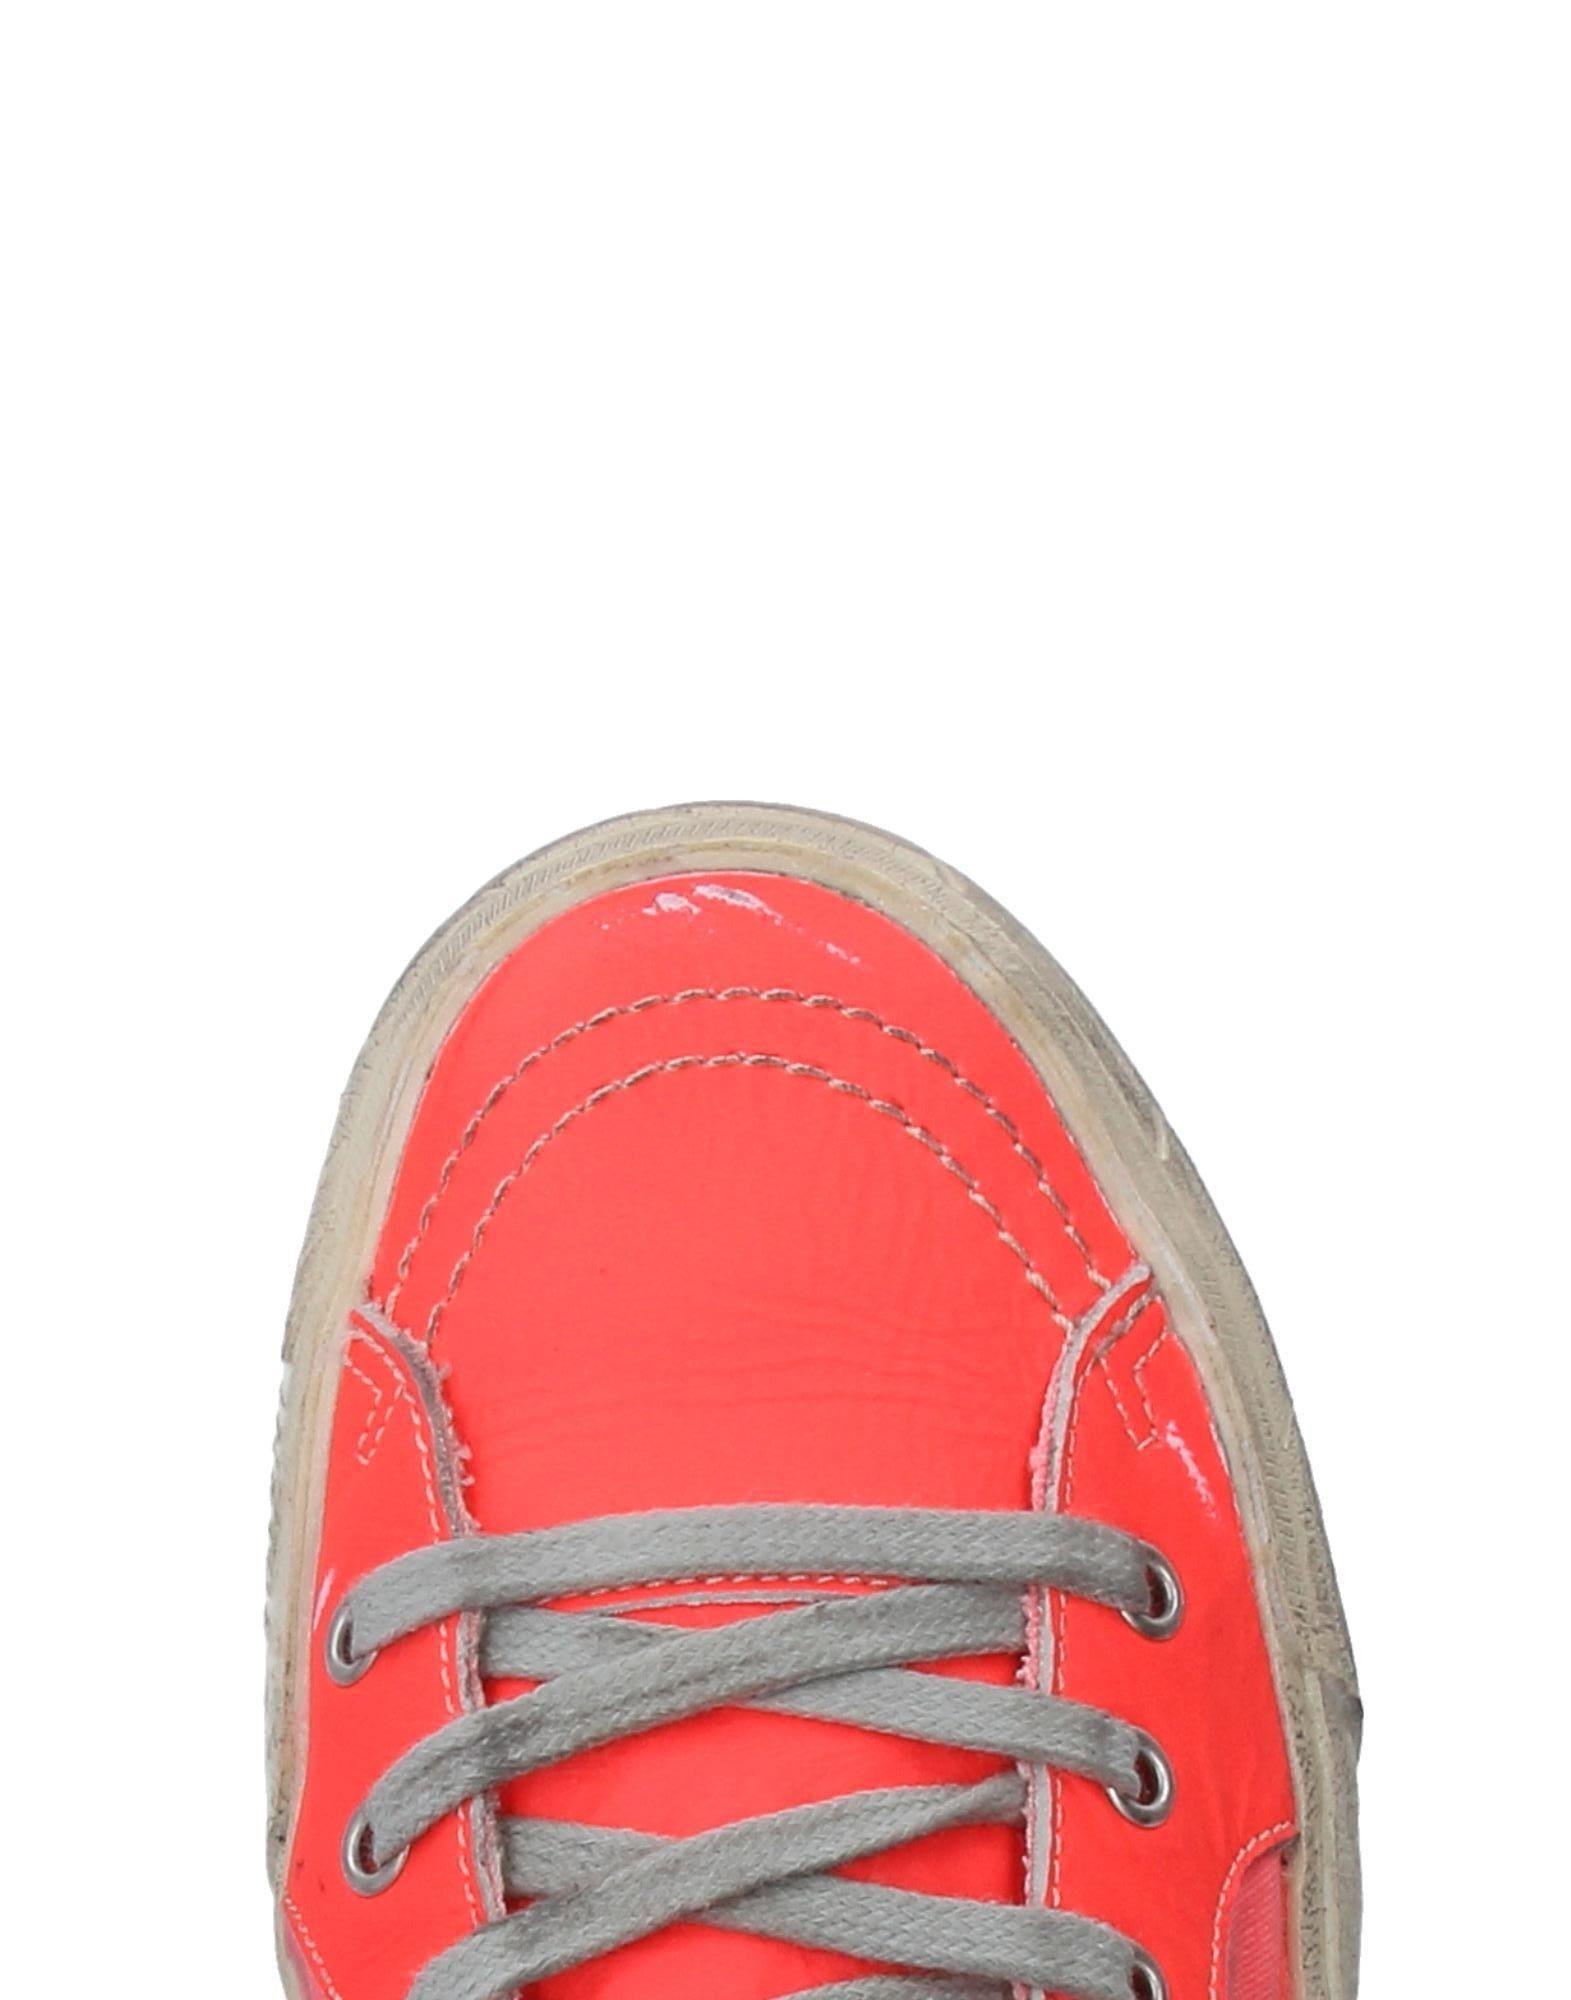 Golden Goose Deluxe Brand Sneakers Damen  11270172WLGut aussehende strapazierfähige Schuhe